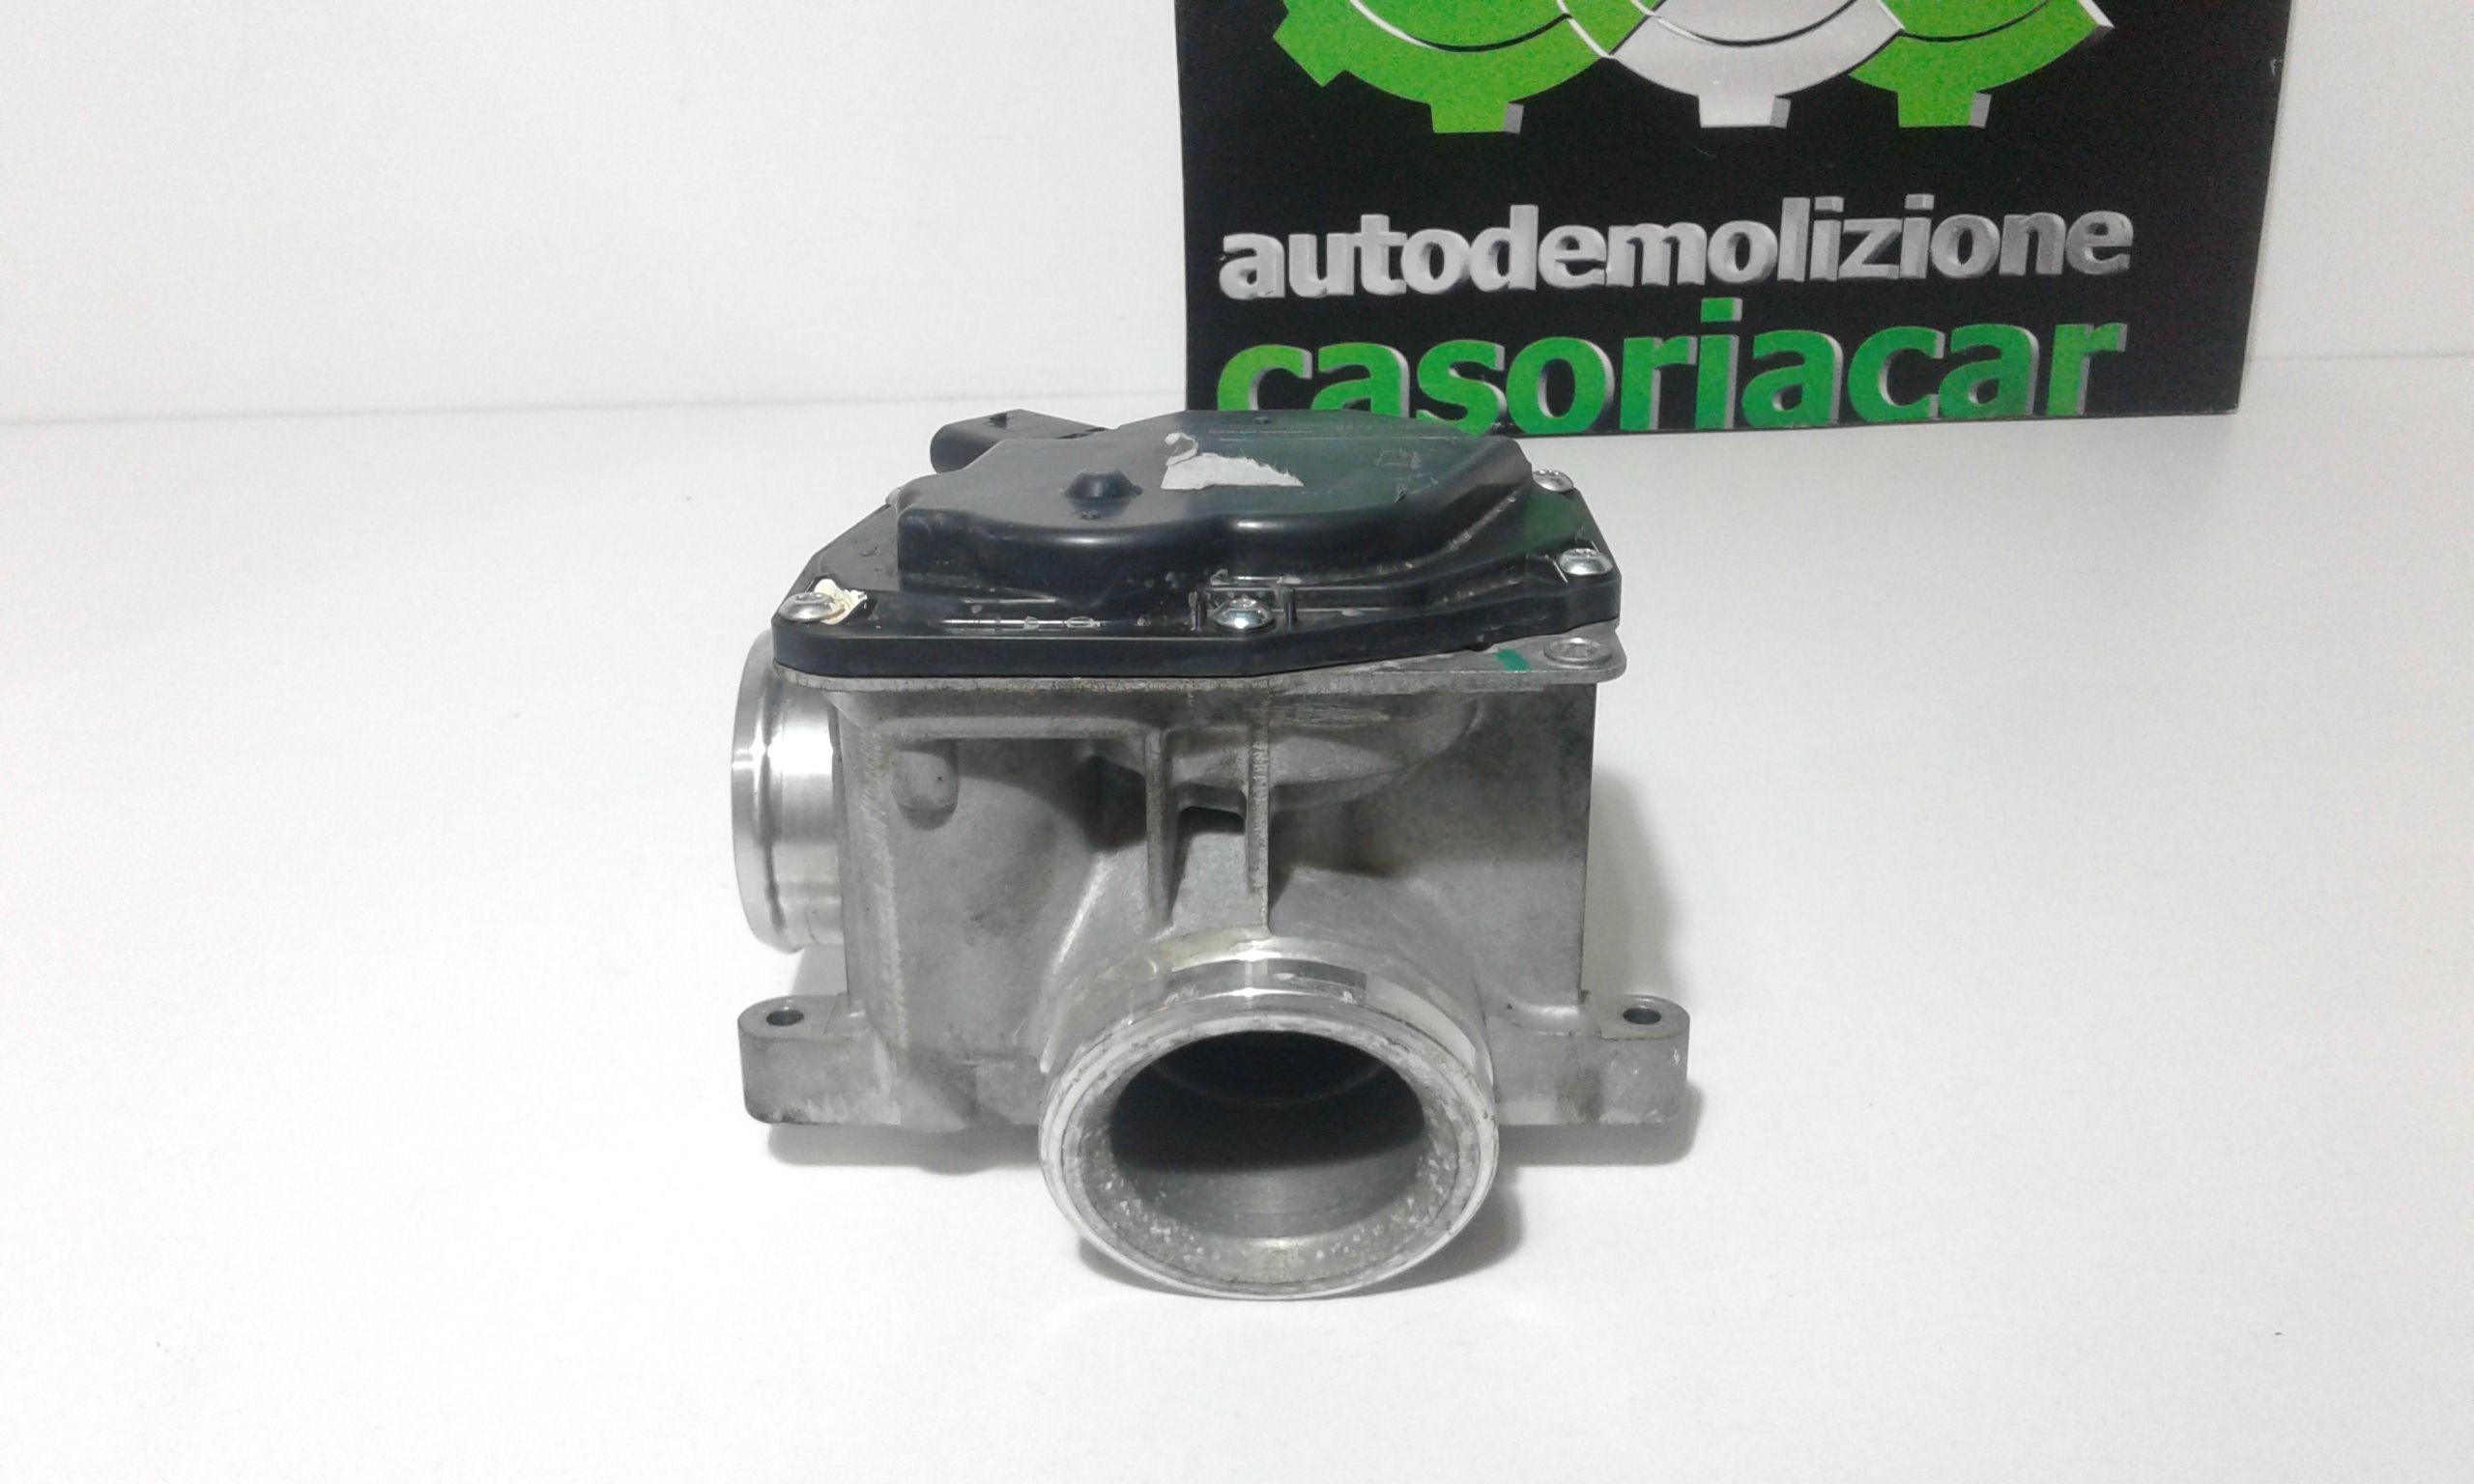 55283136 VALVOLA EGR FIAT 500 X 1° Serie 1600 Diesel (2017) RICAMBI USATI